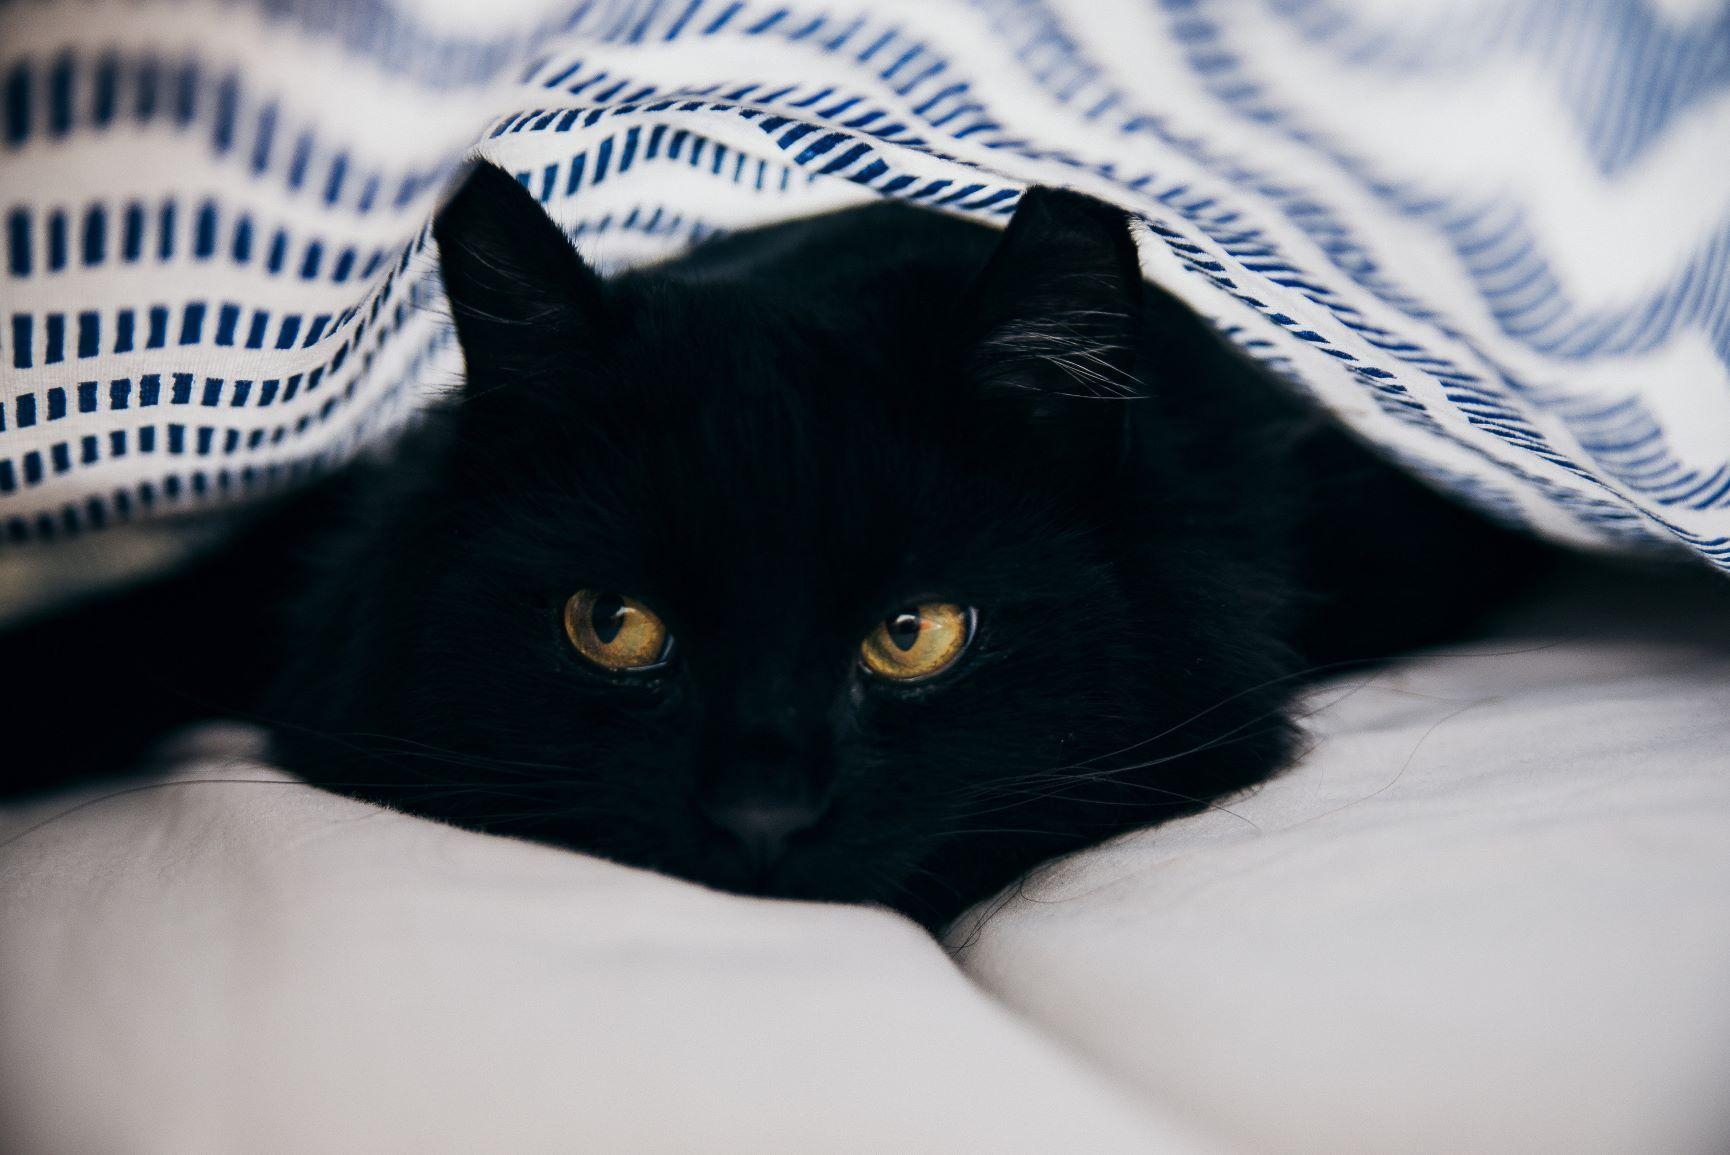 Crne žene crna maca